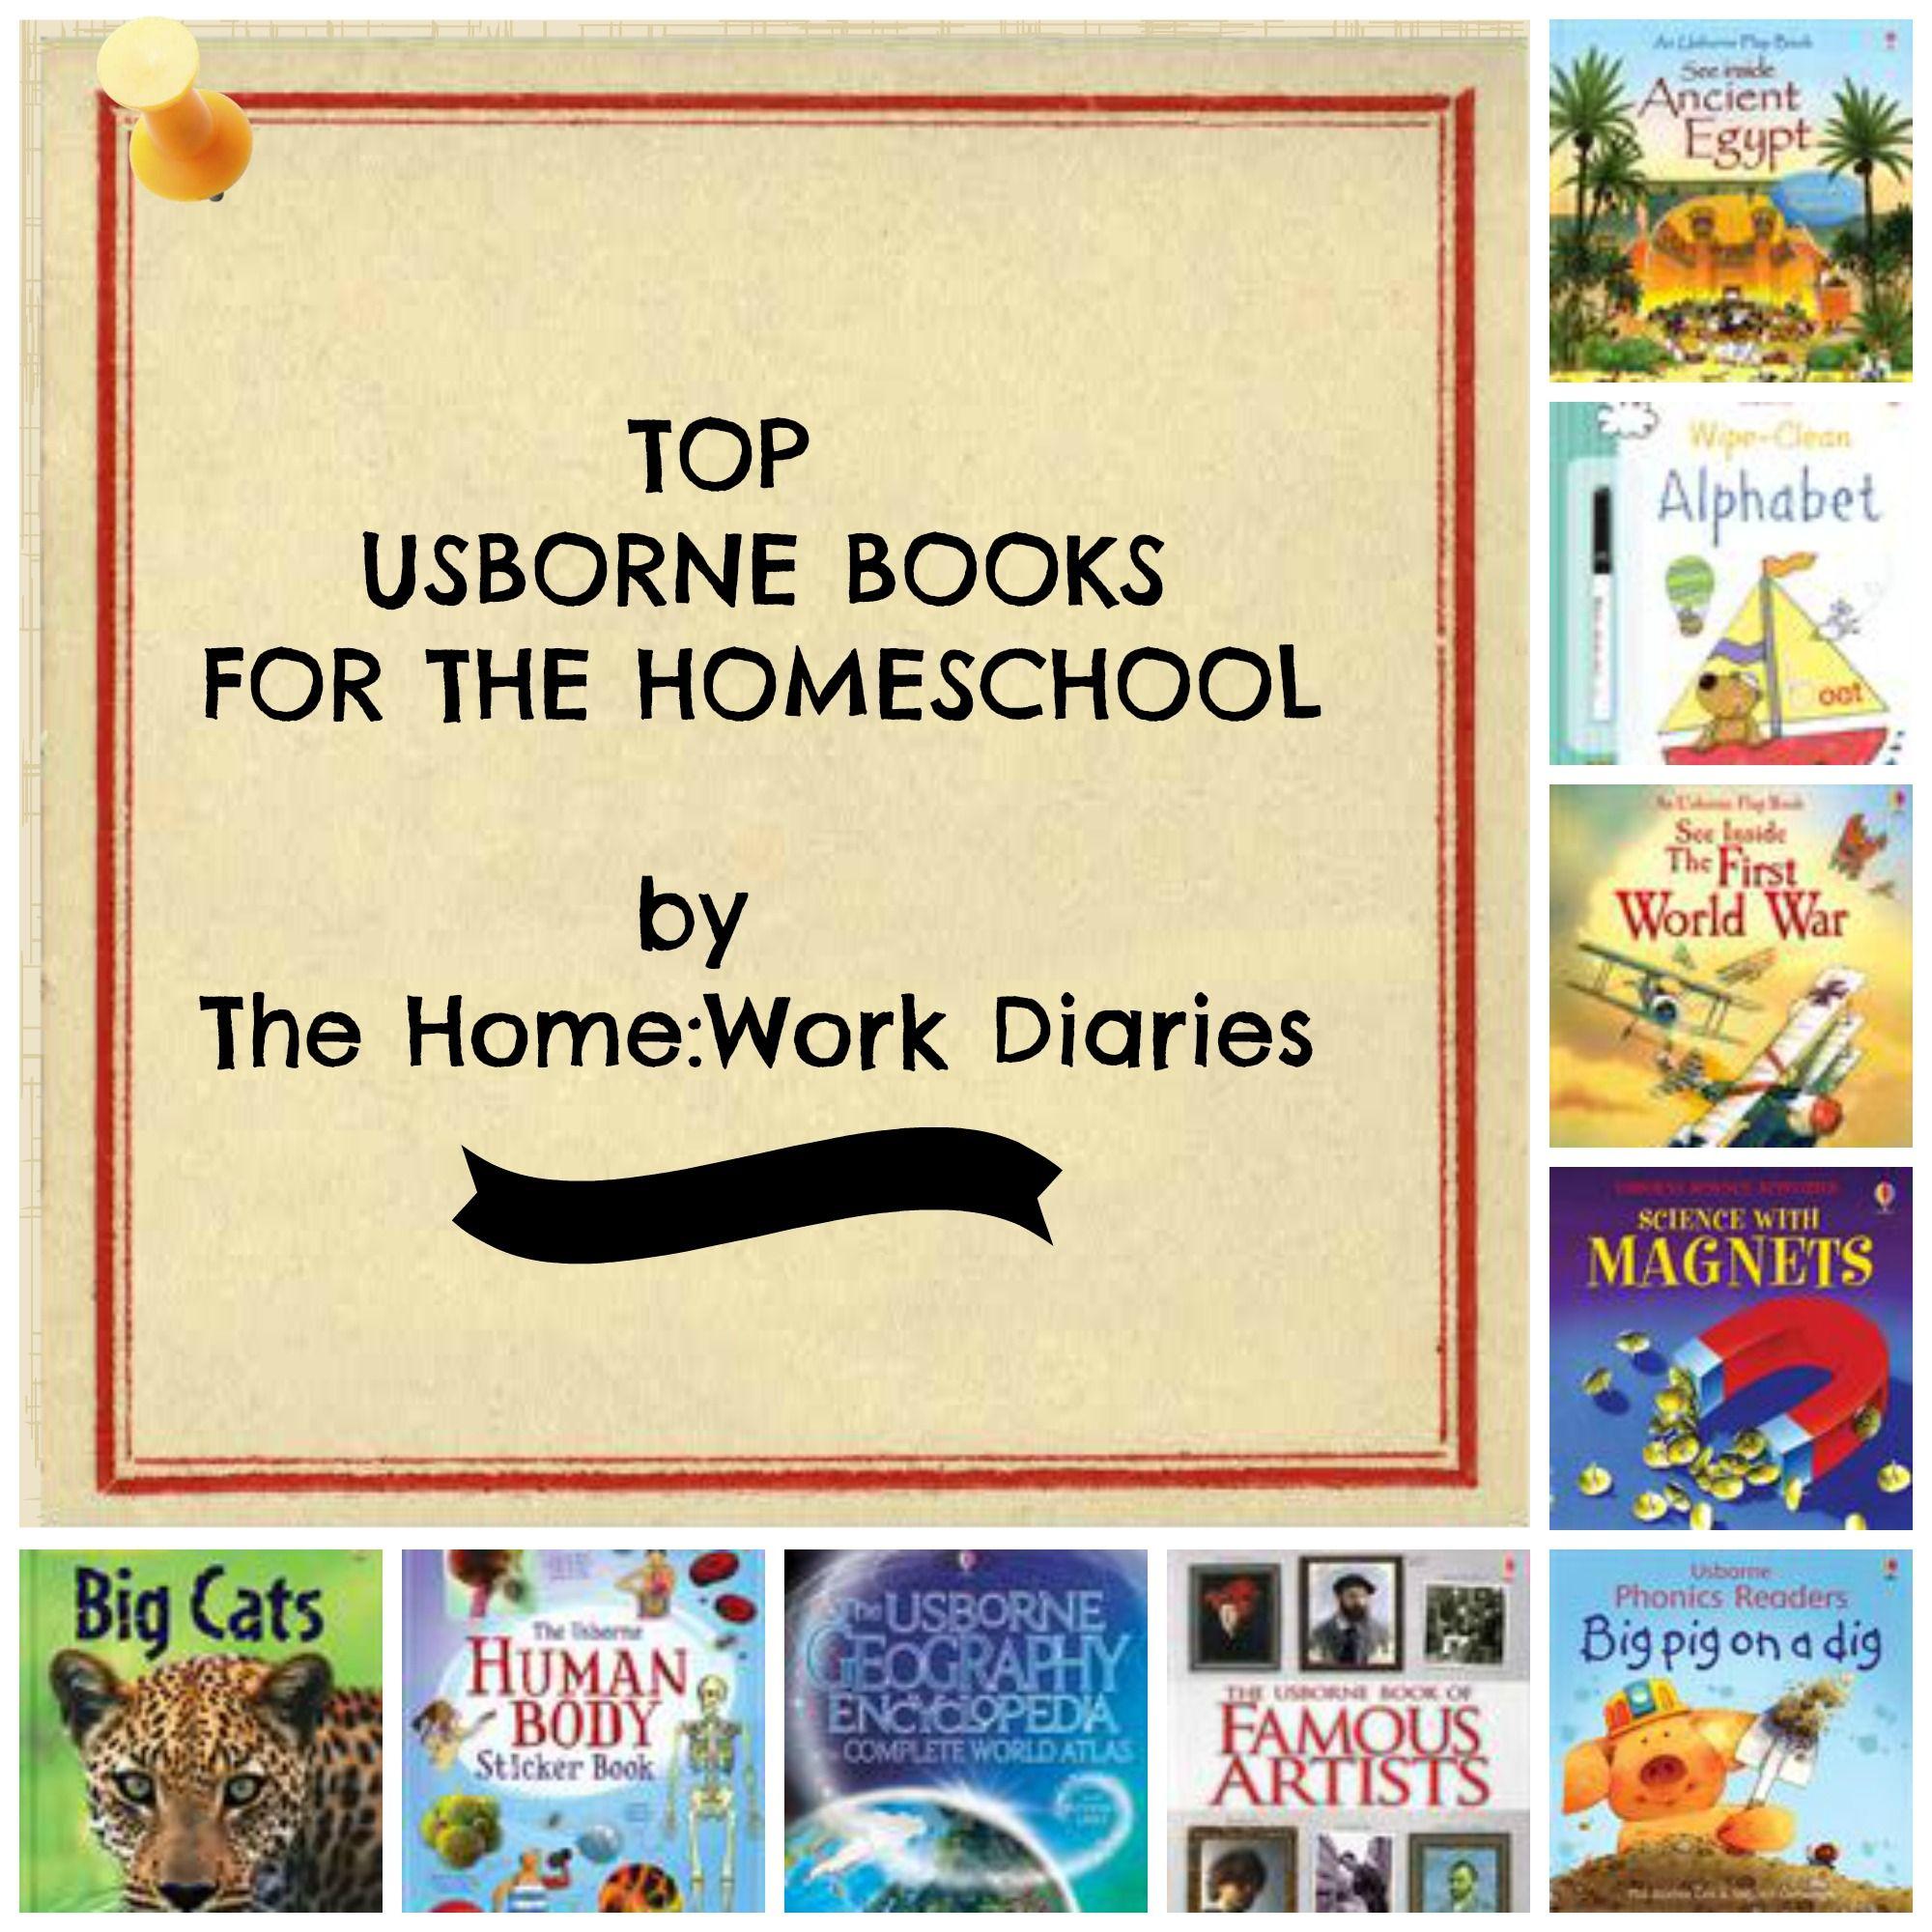 Top Usborne Books for the Homeschool www.readwithme.xyz